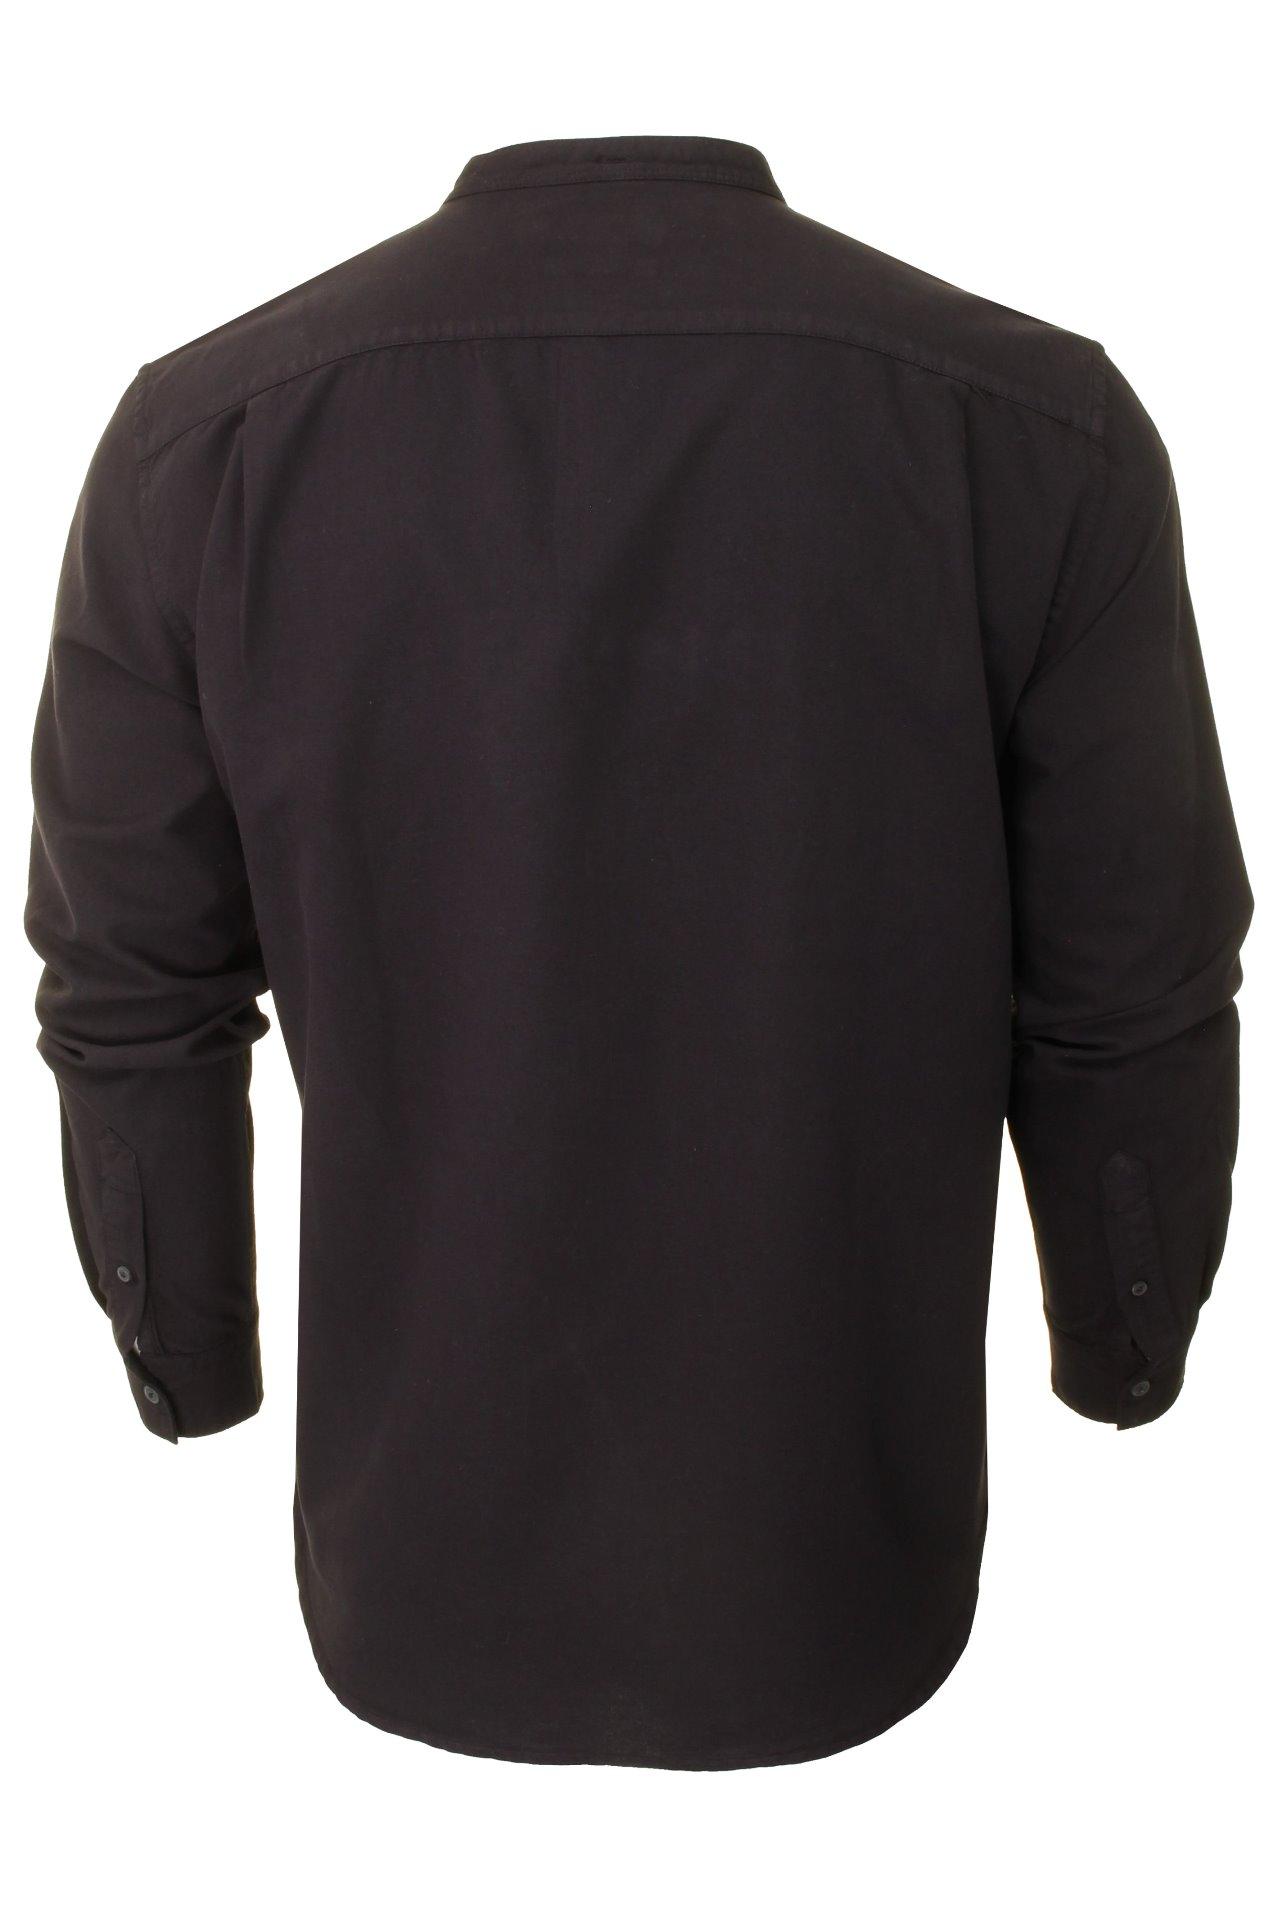 French-Connection-Mens-Oxford-Grandad-Shirt-Long-Sleeved thumbnail 4